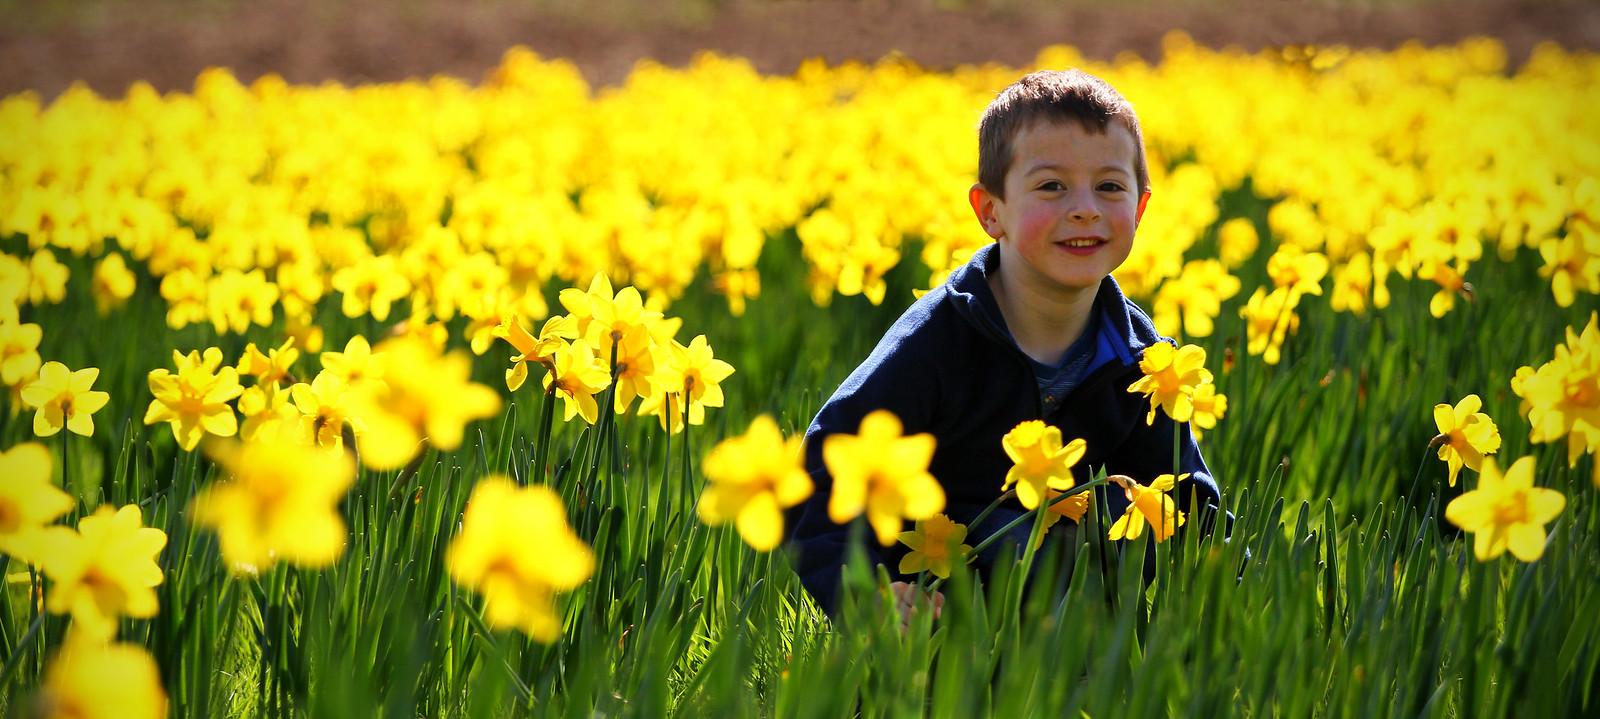 Ben Daffodils